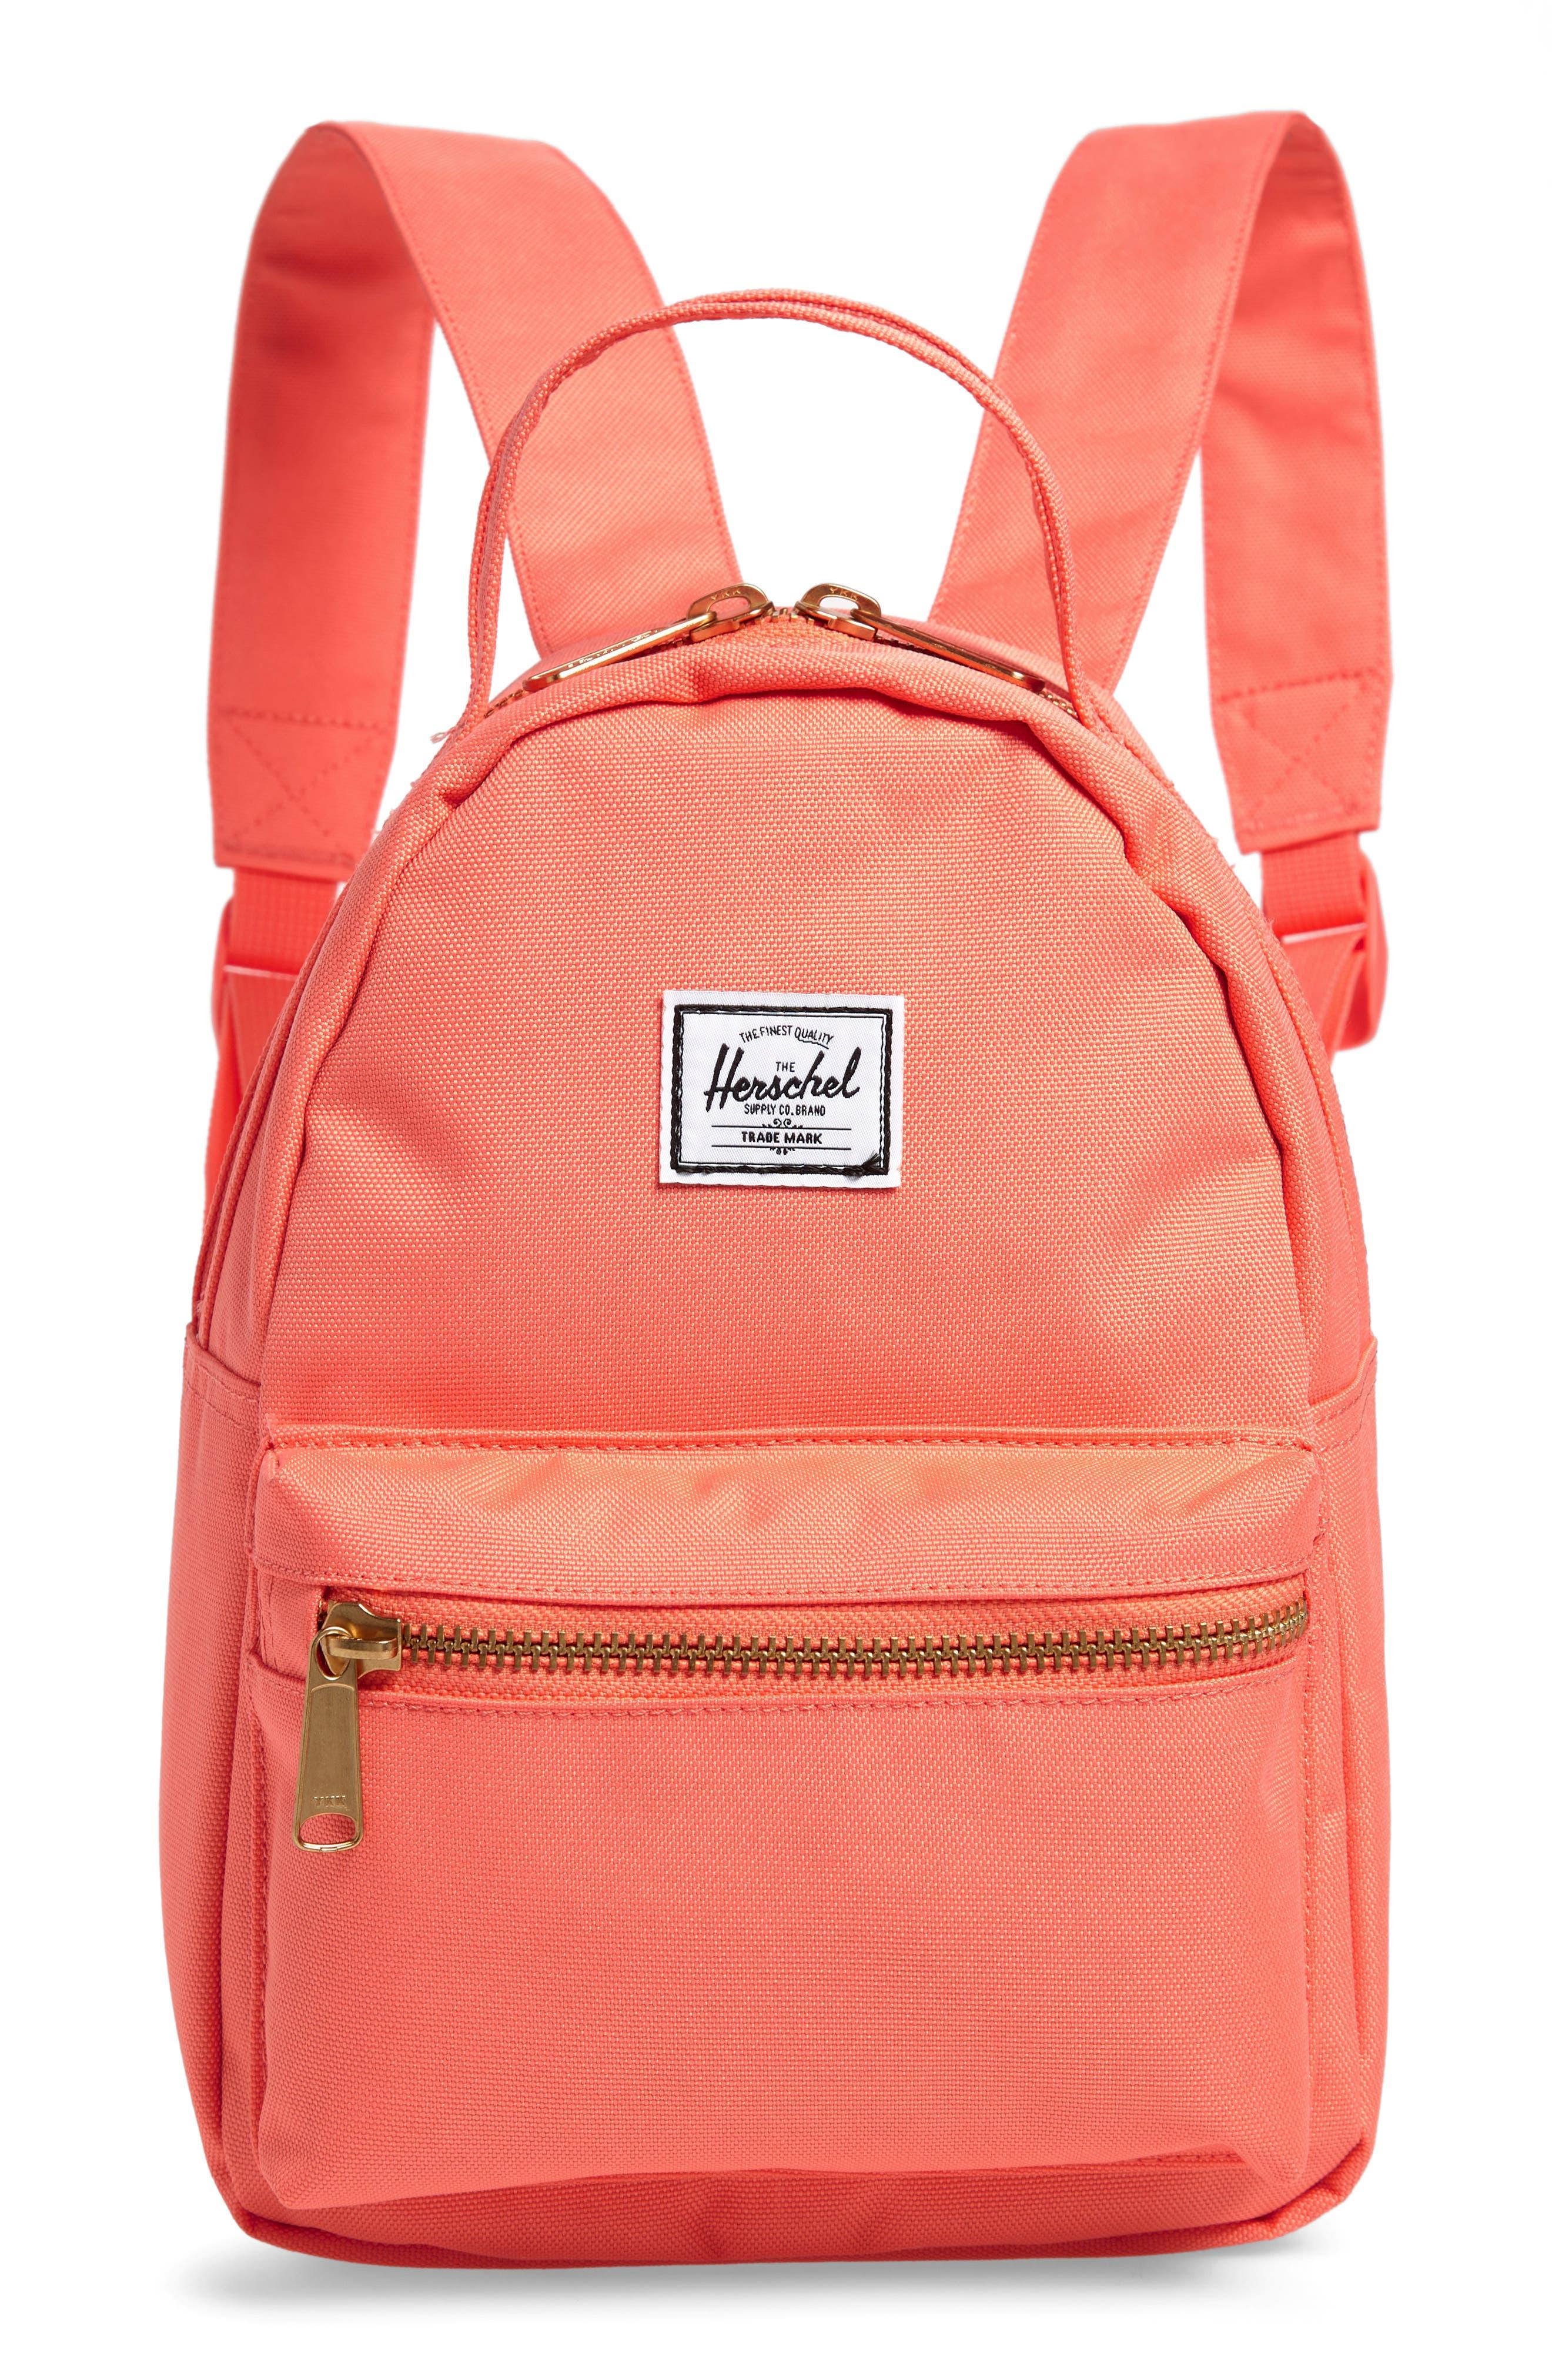 Herschel Supply Co. Mini Nova Backpack - Orange